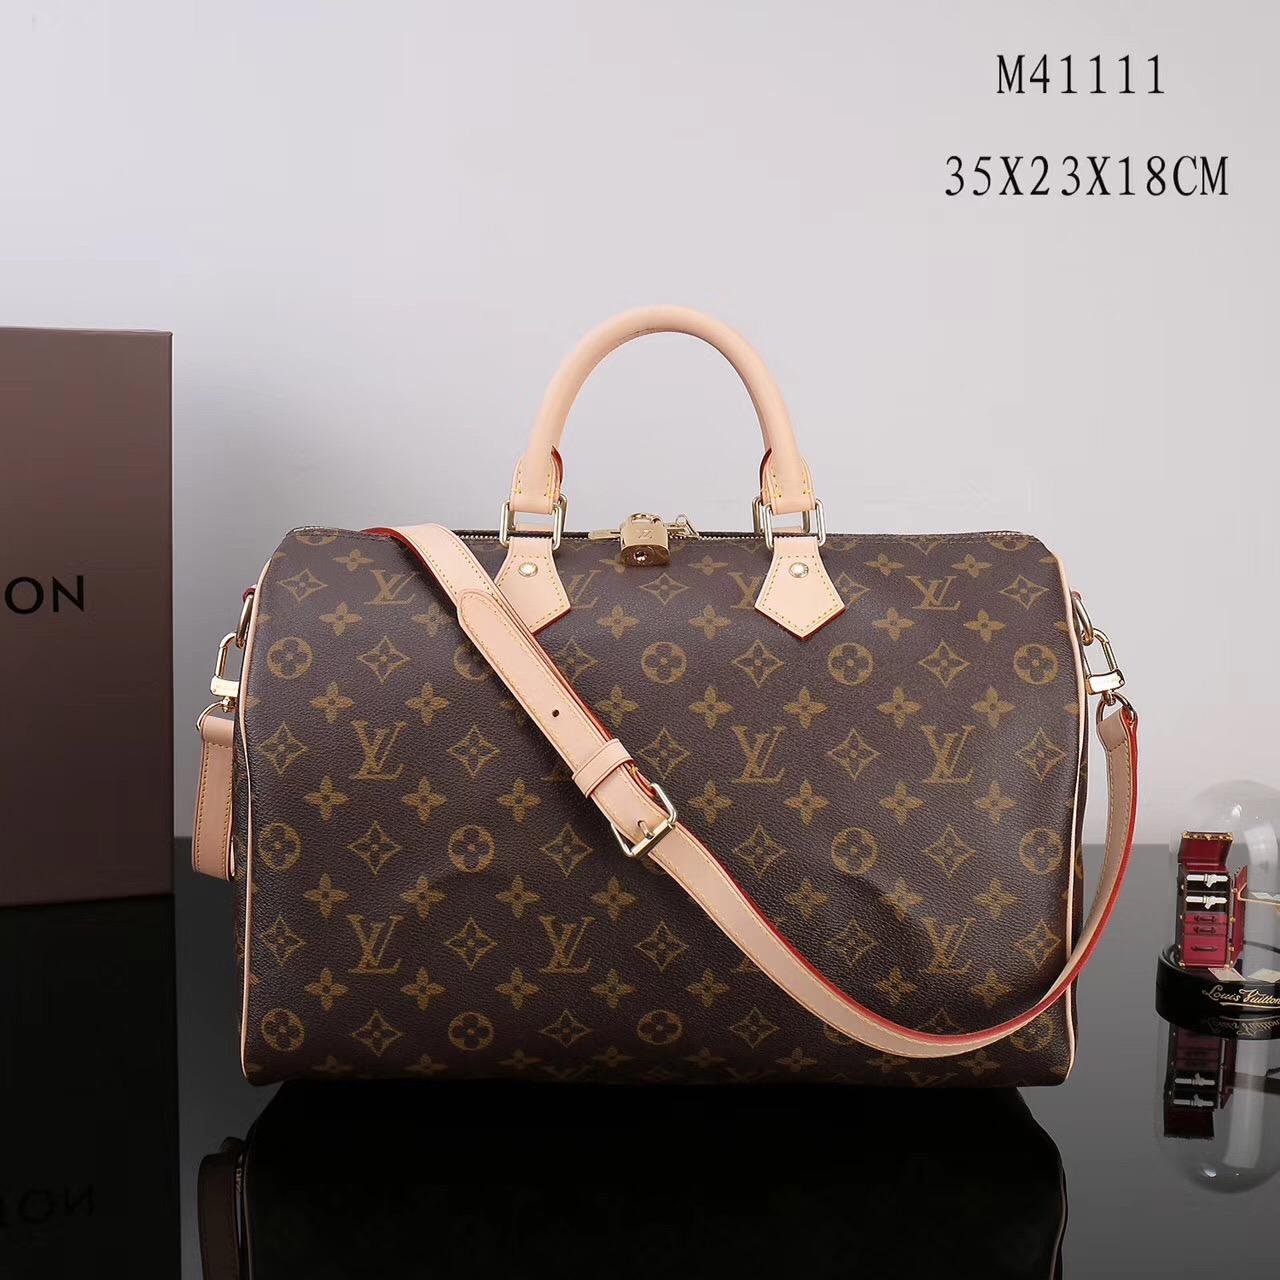 05fc4ed0f806 LV Louis Vuitton Speedy 35 Monogram bags M41111 Handbags Brown